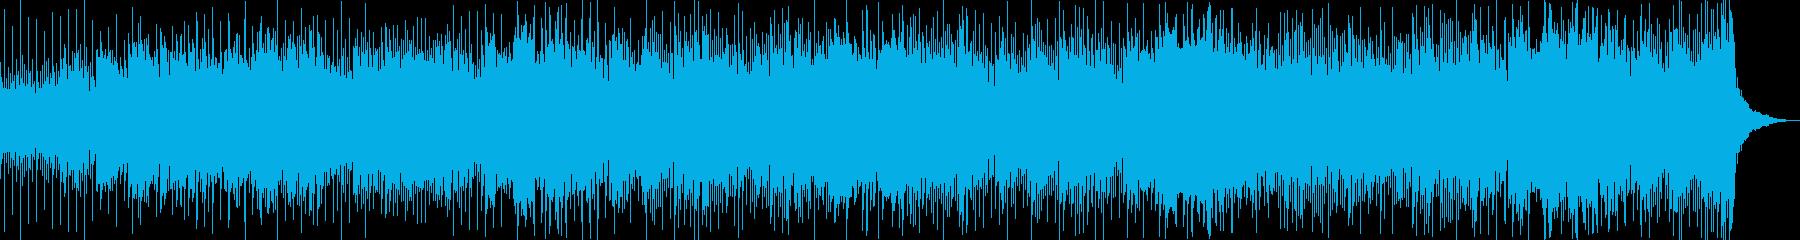 Refreshing feeling, drive, train, train, daily BGM's reproduced waveform